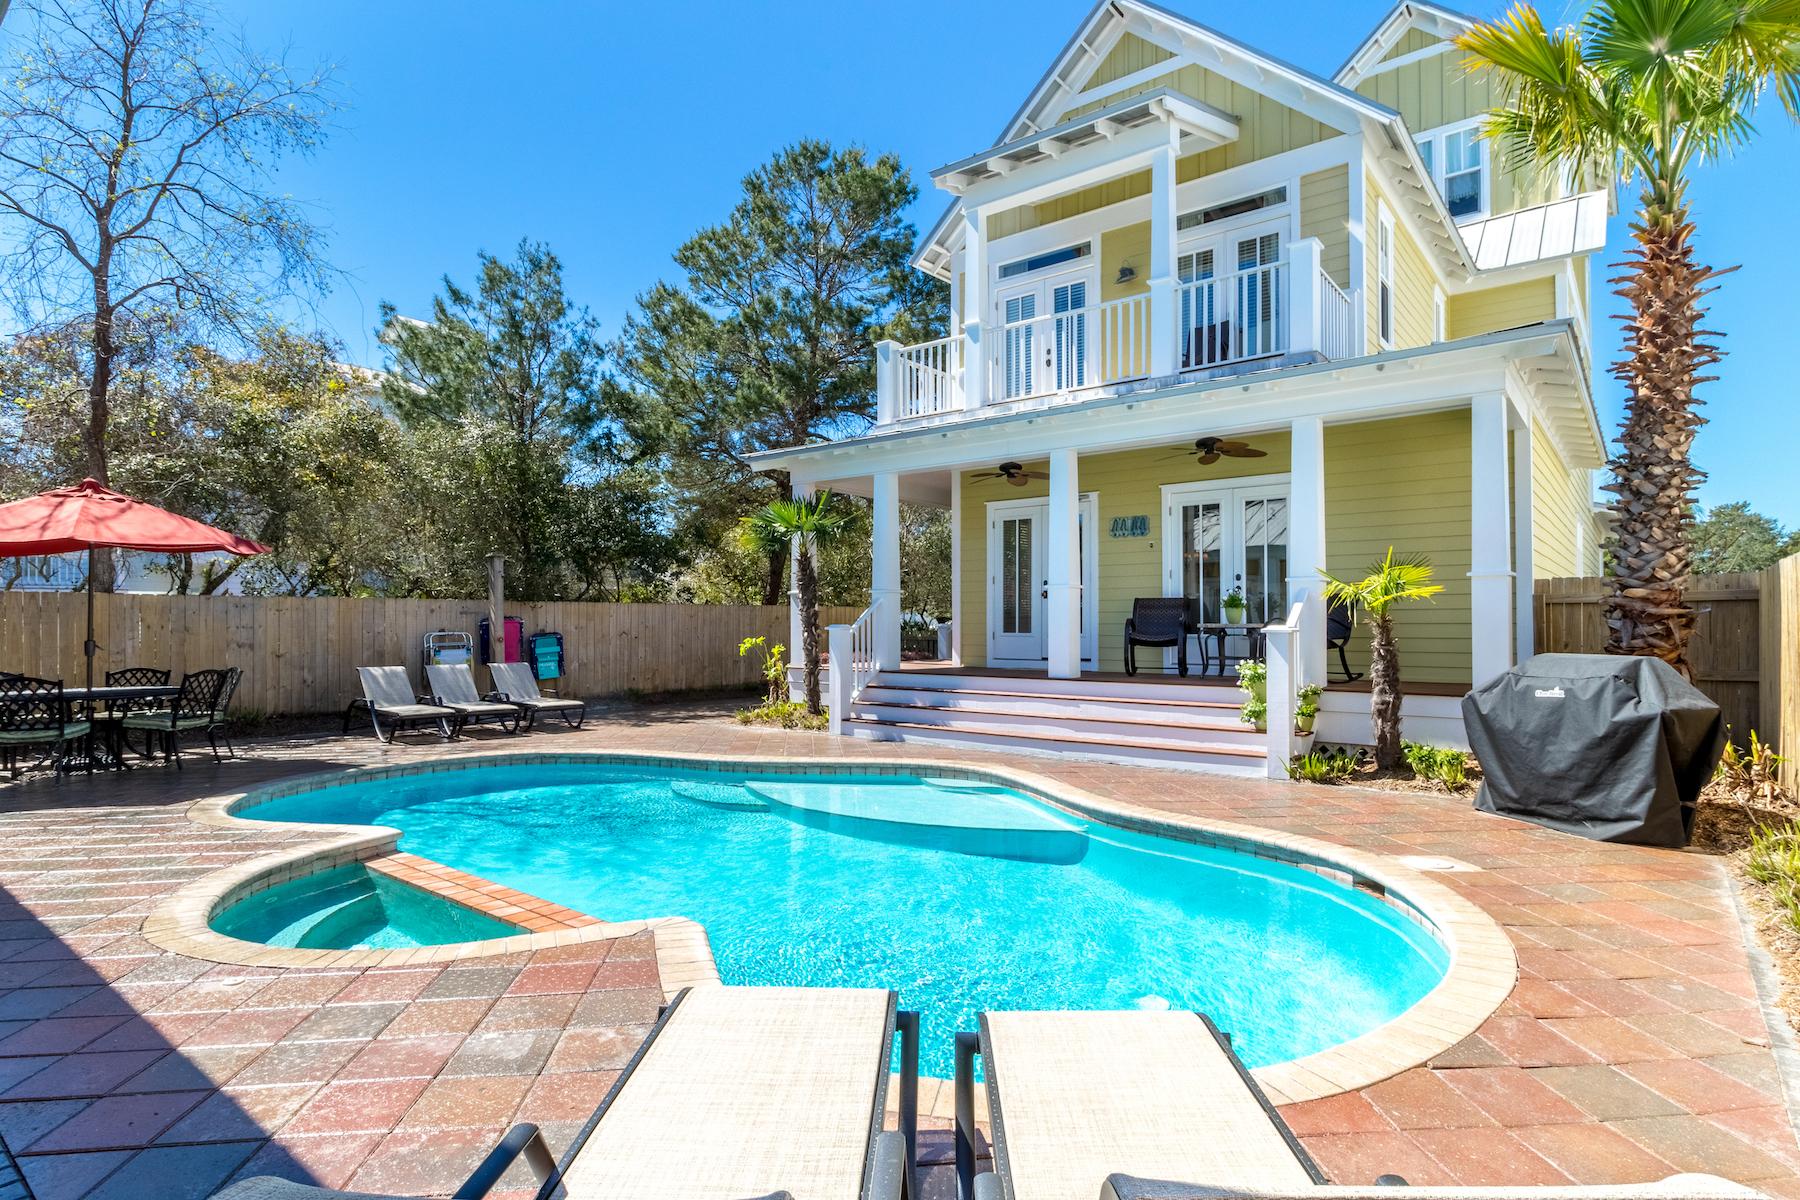 Moradia para Venda às Sleeps 18 and Has Large Private Pool in Crystal Beach 91 Barracuda Street, Destin, Florida, 32541 Estados Unidos